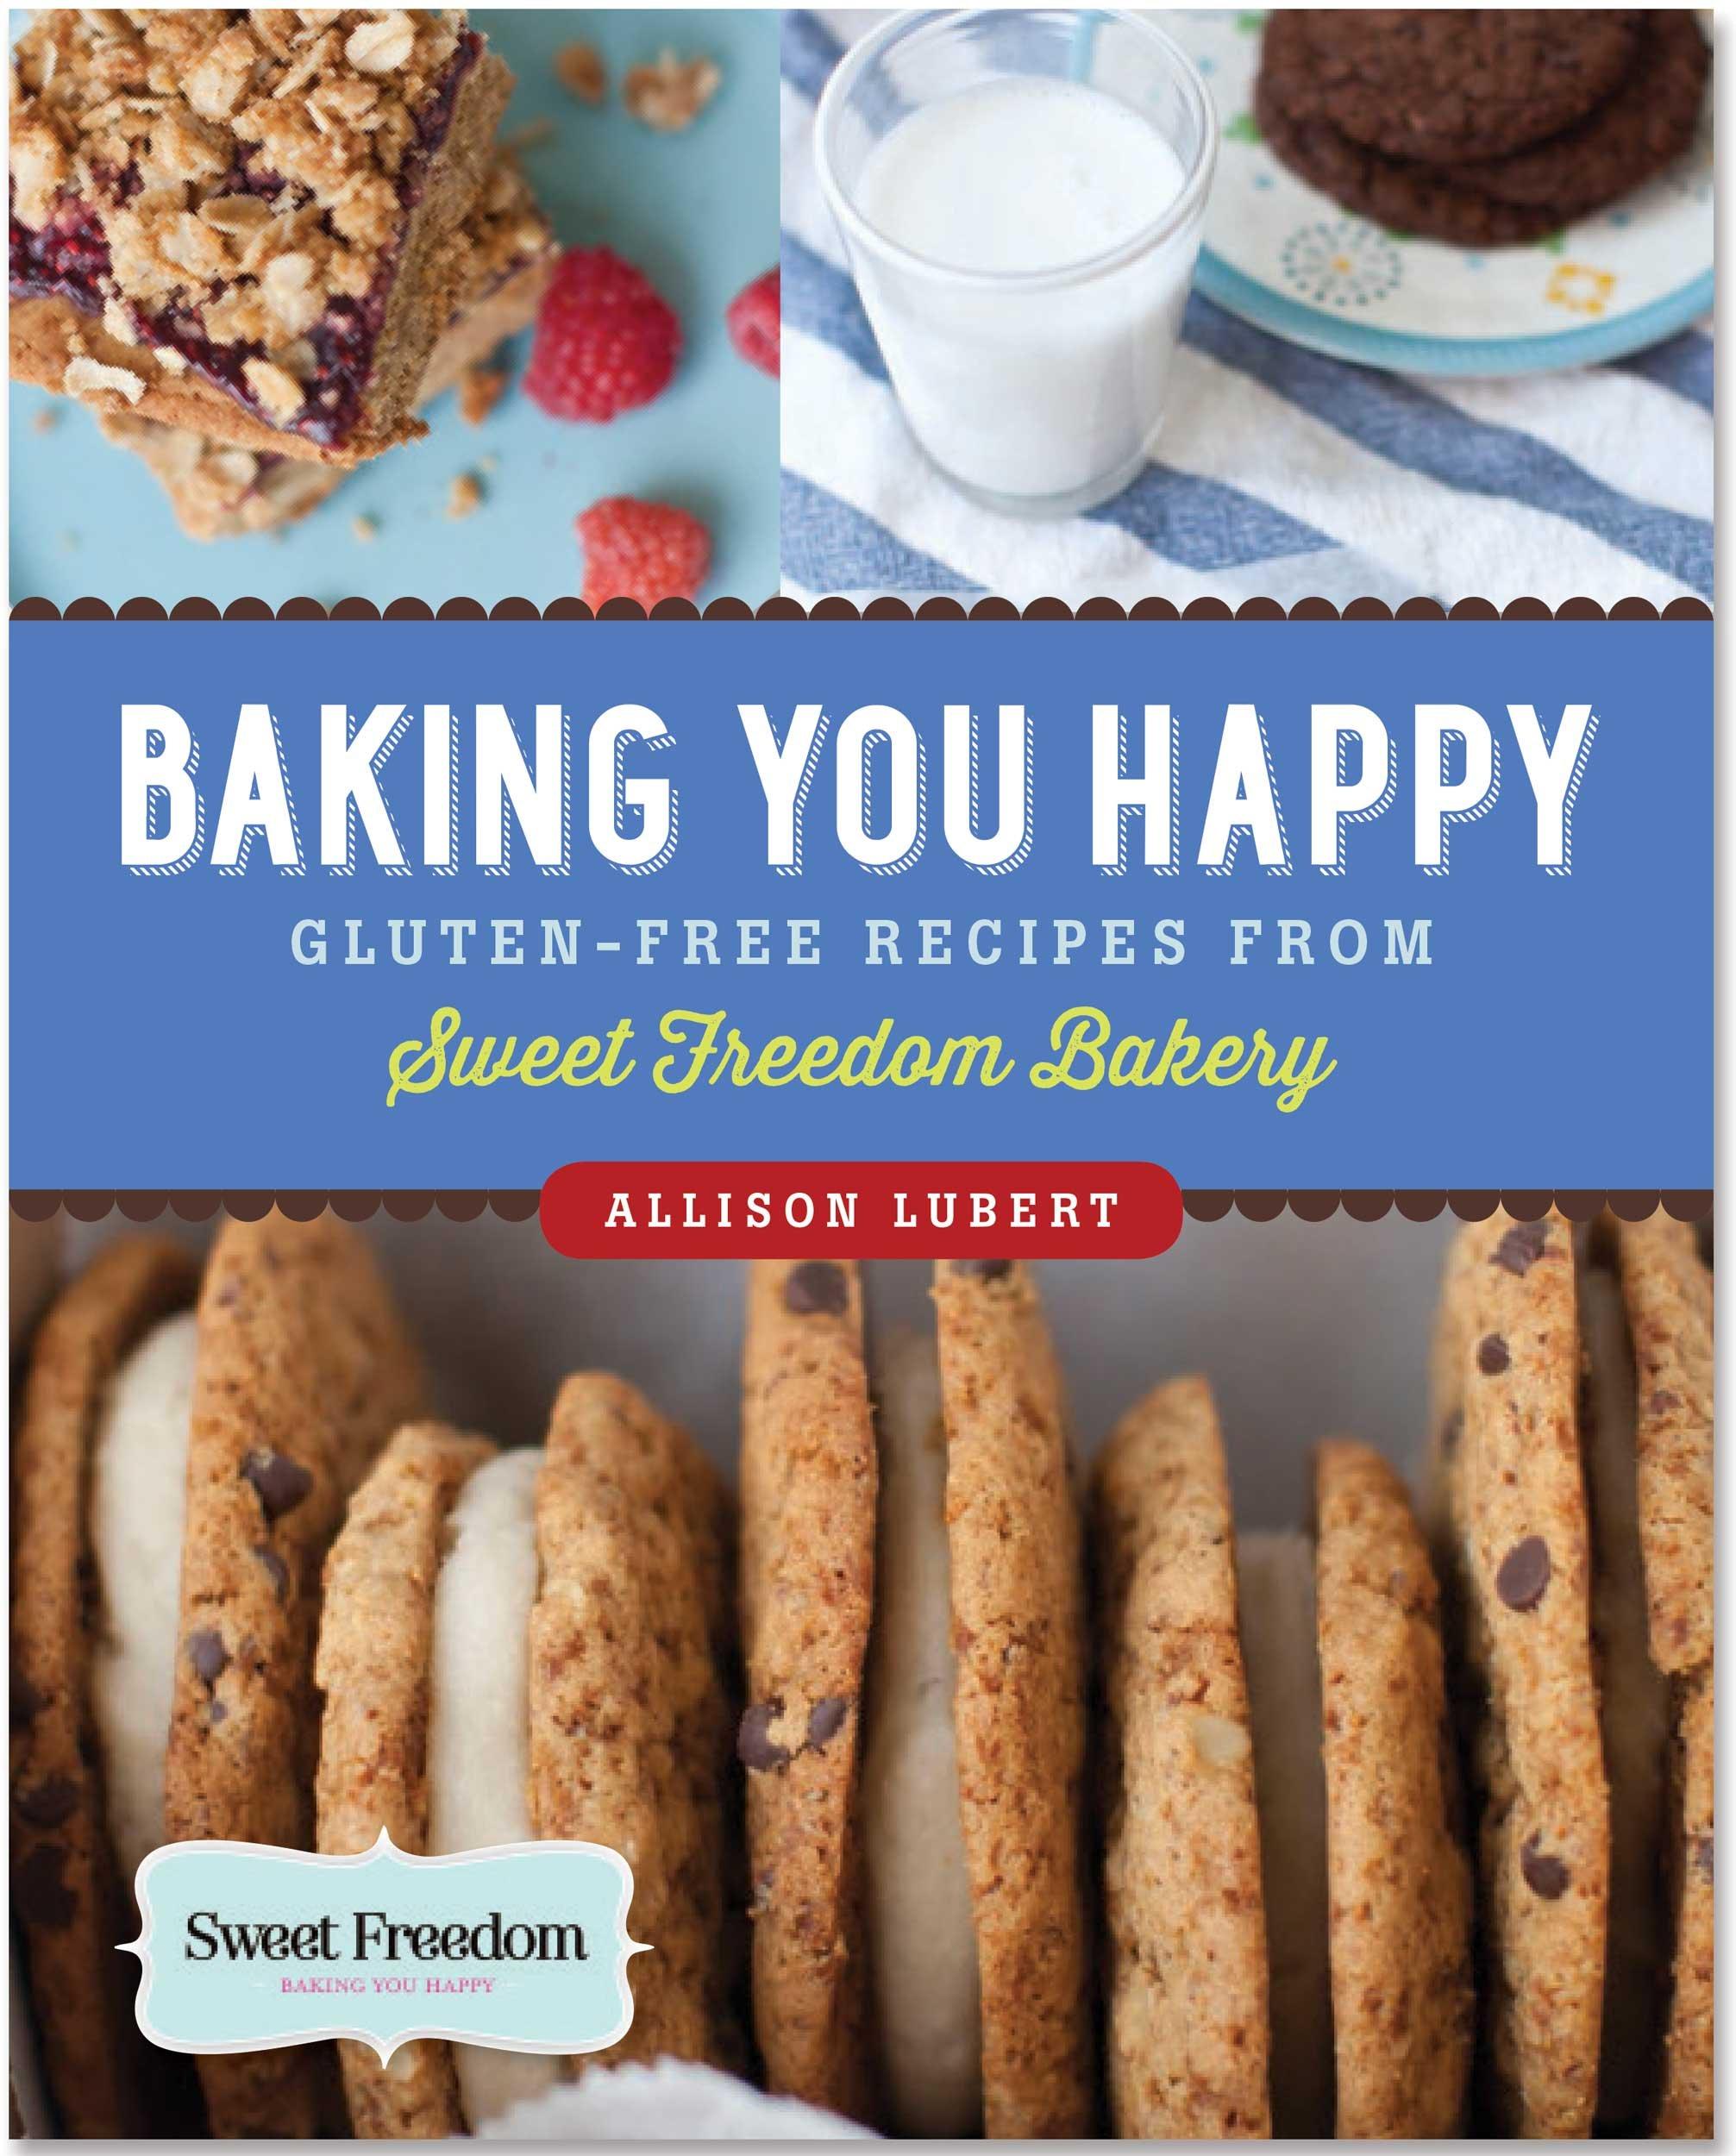 Baking You Happy Gluten Free Recipes From Sweet Freedom Bakery 100